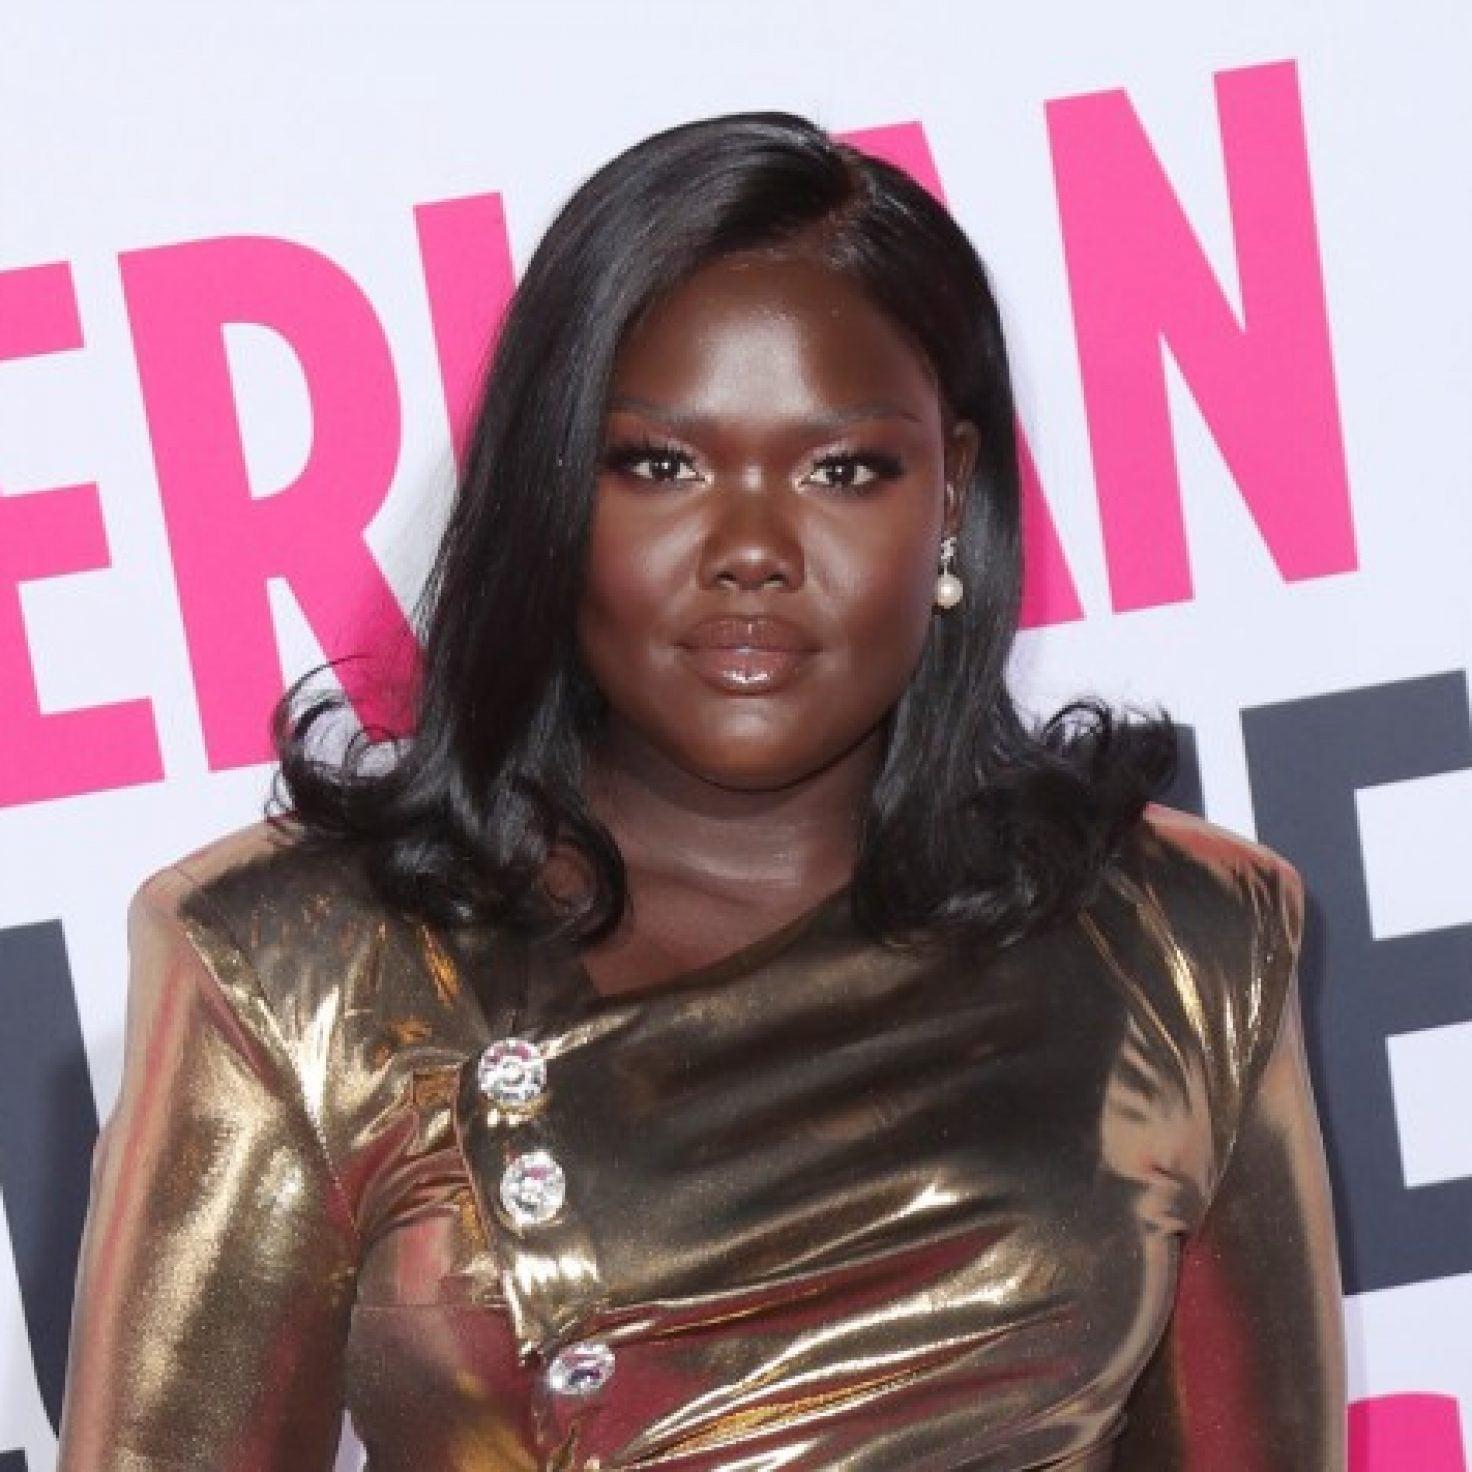 Beauty Guru Nyma Tang Gives Tips On Holiday Makeup For Dark Skin Tones